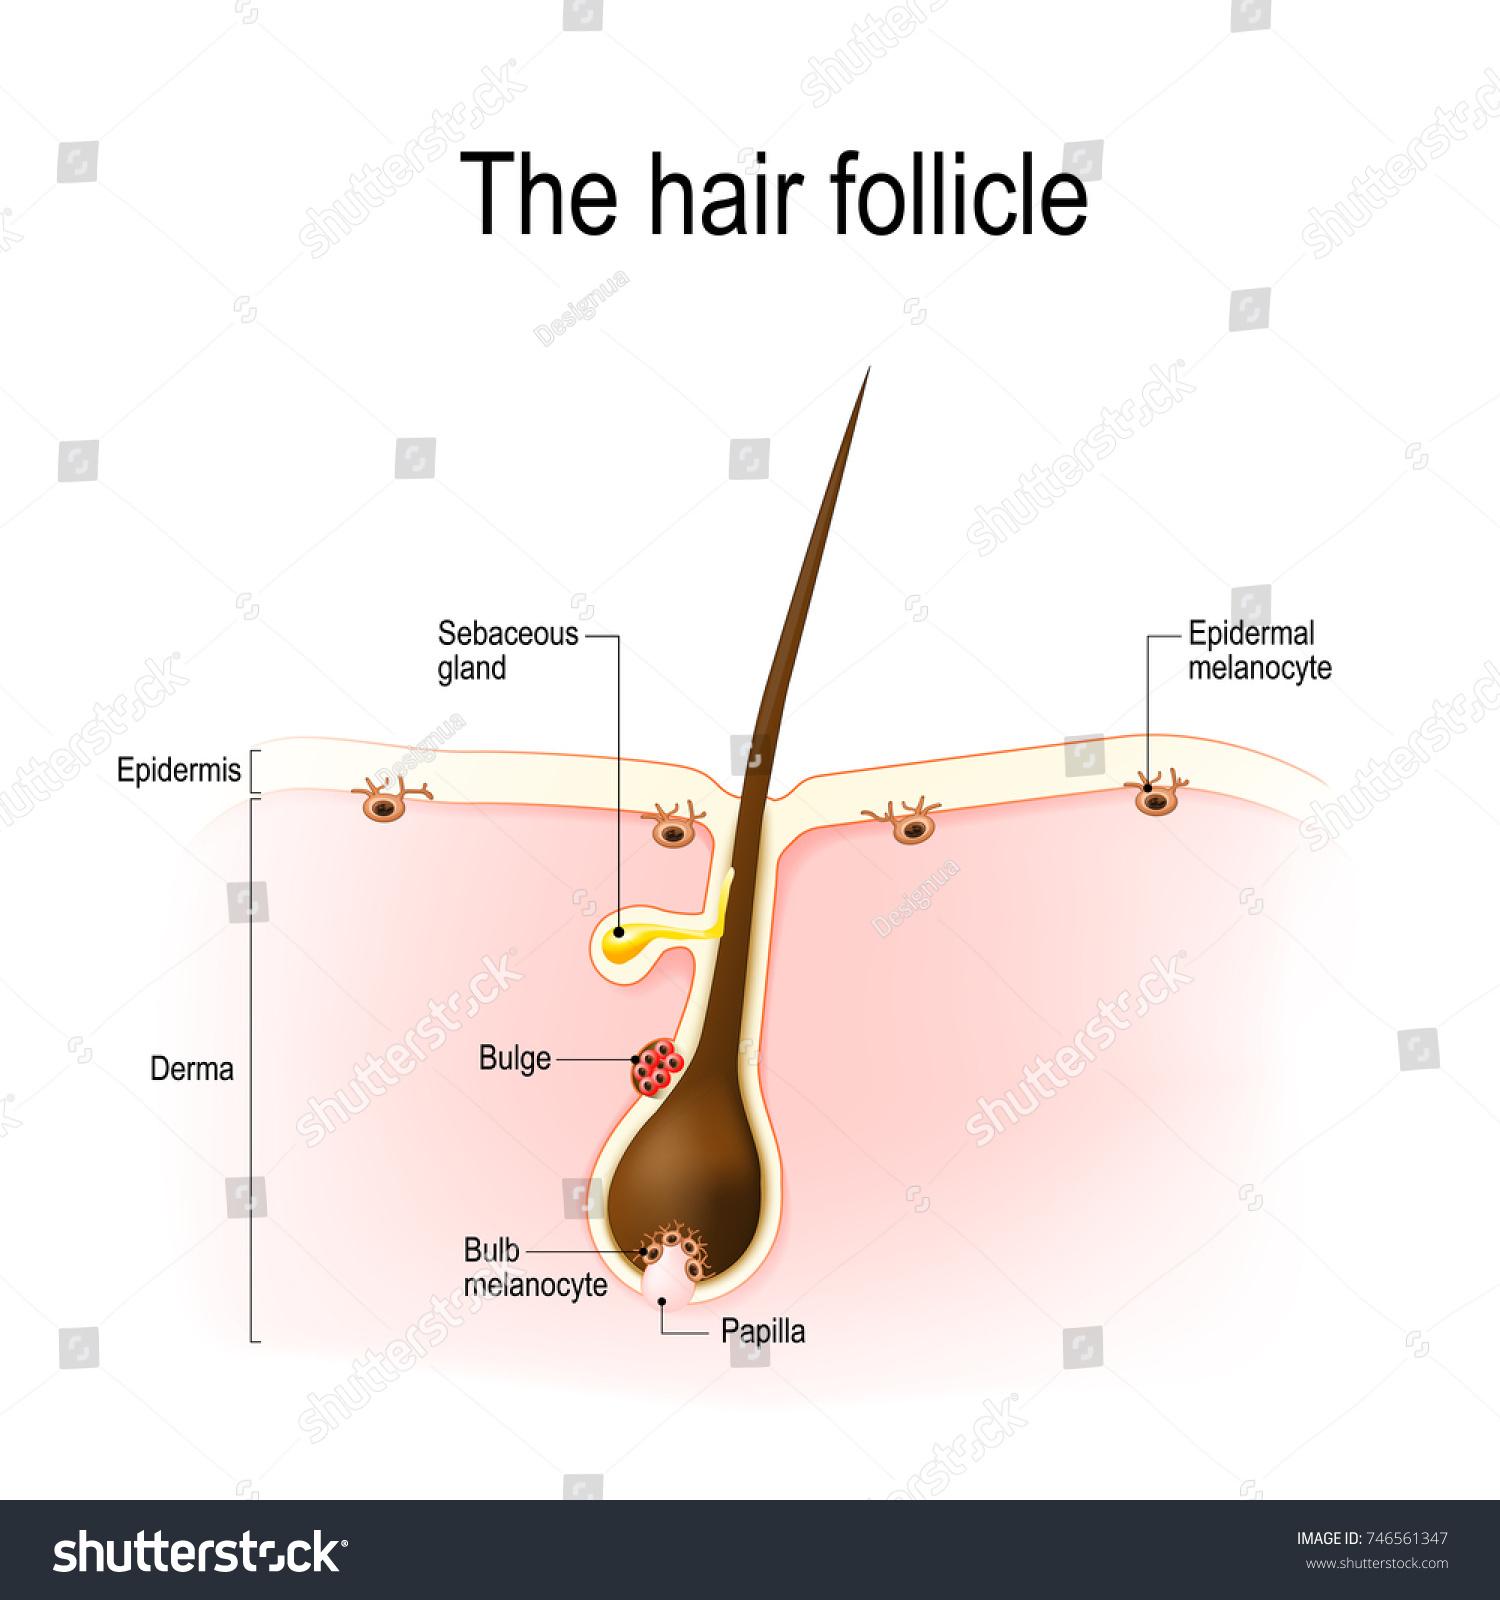 Anatomy hair follicle distribution differentiated immature stock anatomy of the hair follicle distribution of differentiated and immature melanocytes is shown pooptronica Choice Image